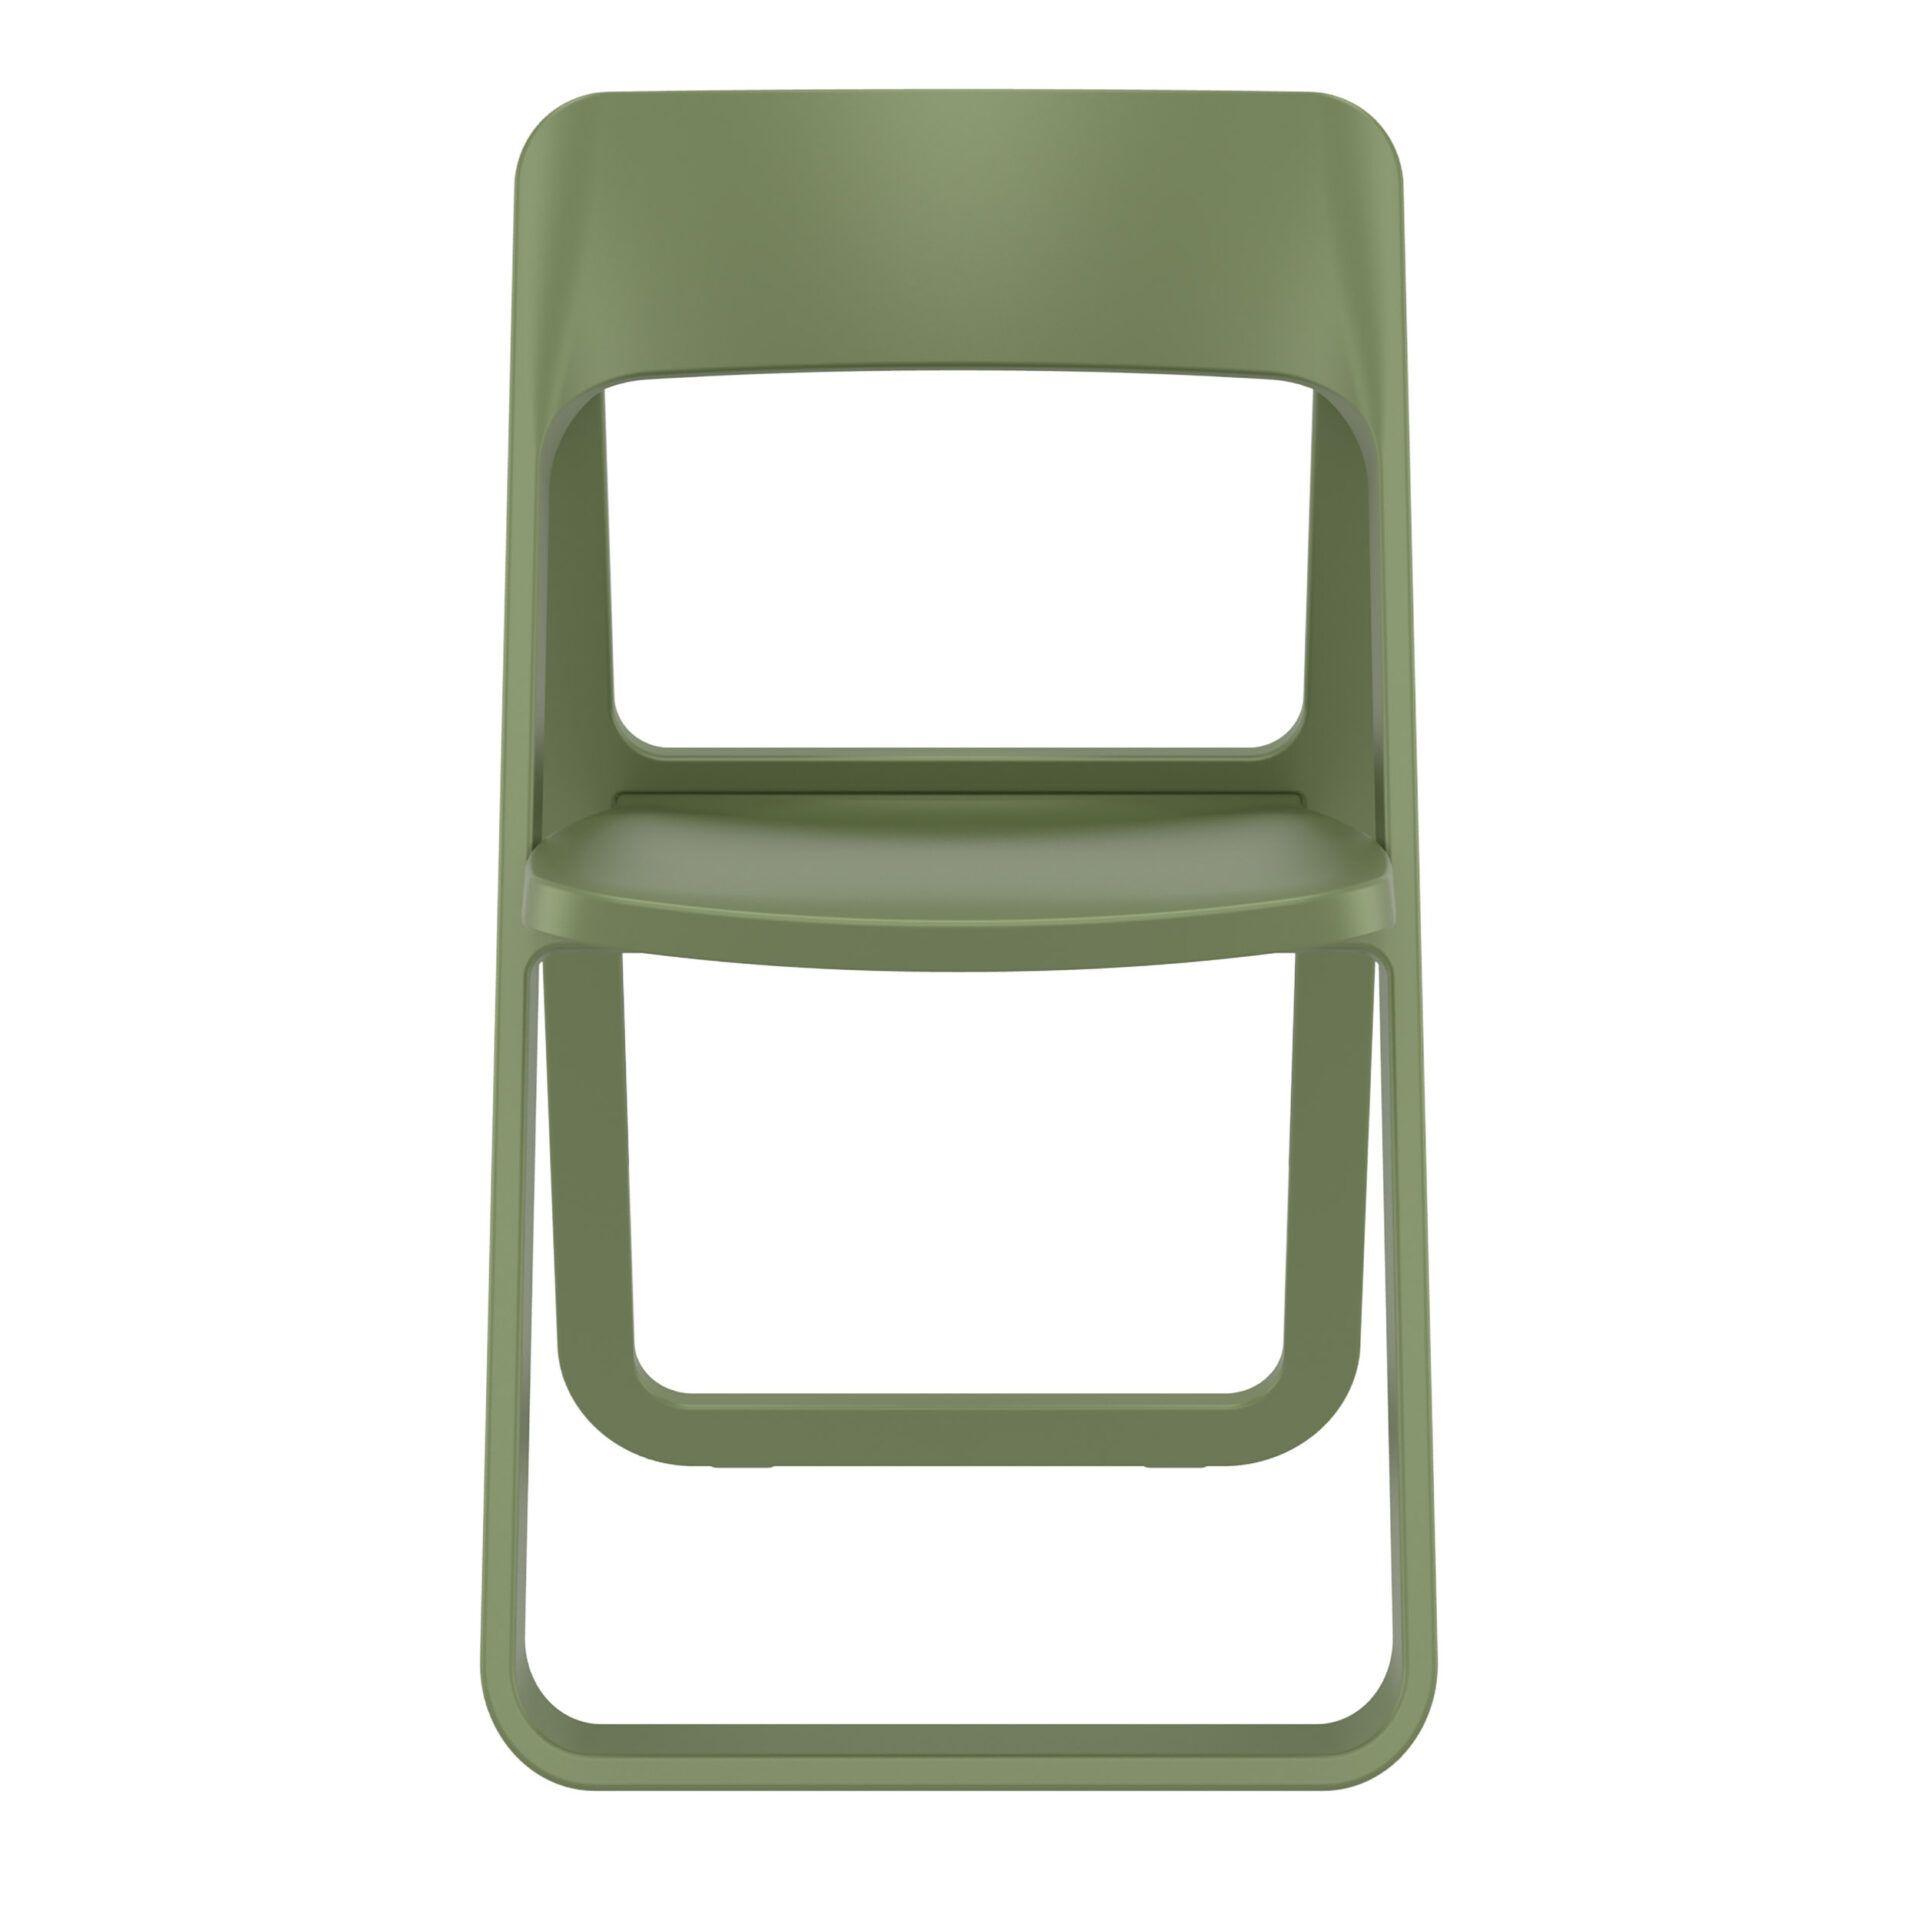 polypropylene dream folding chair olive green front